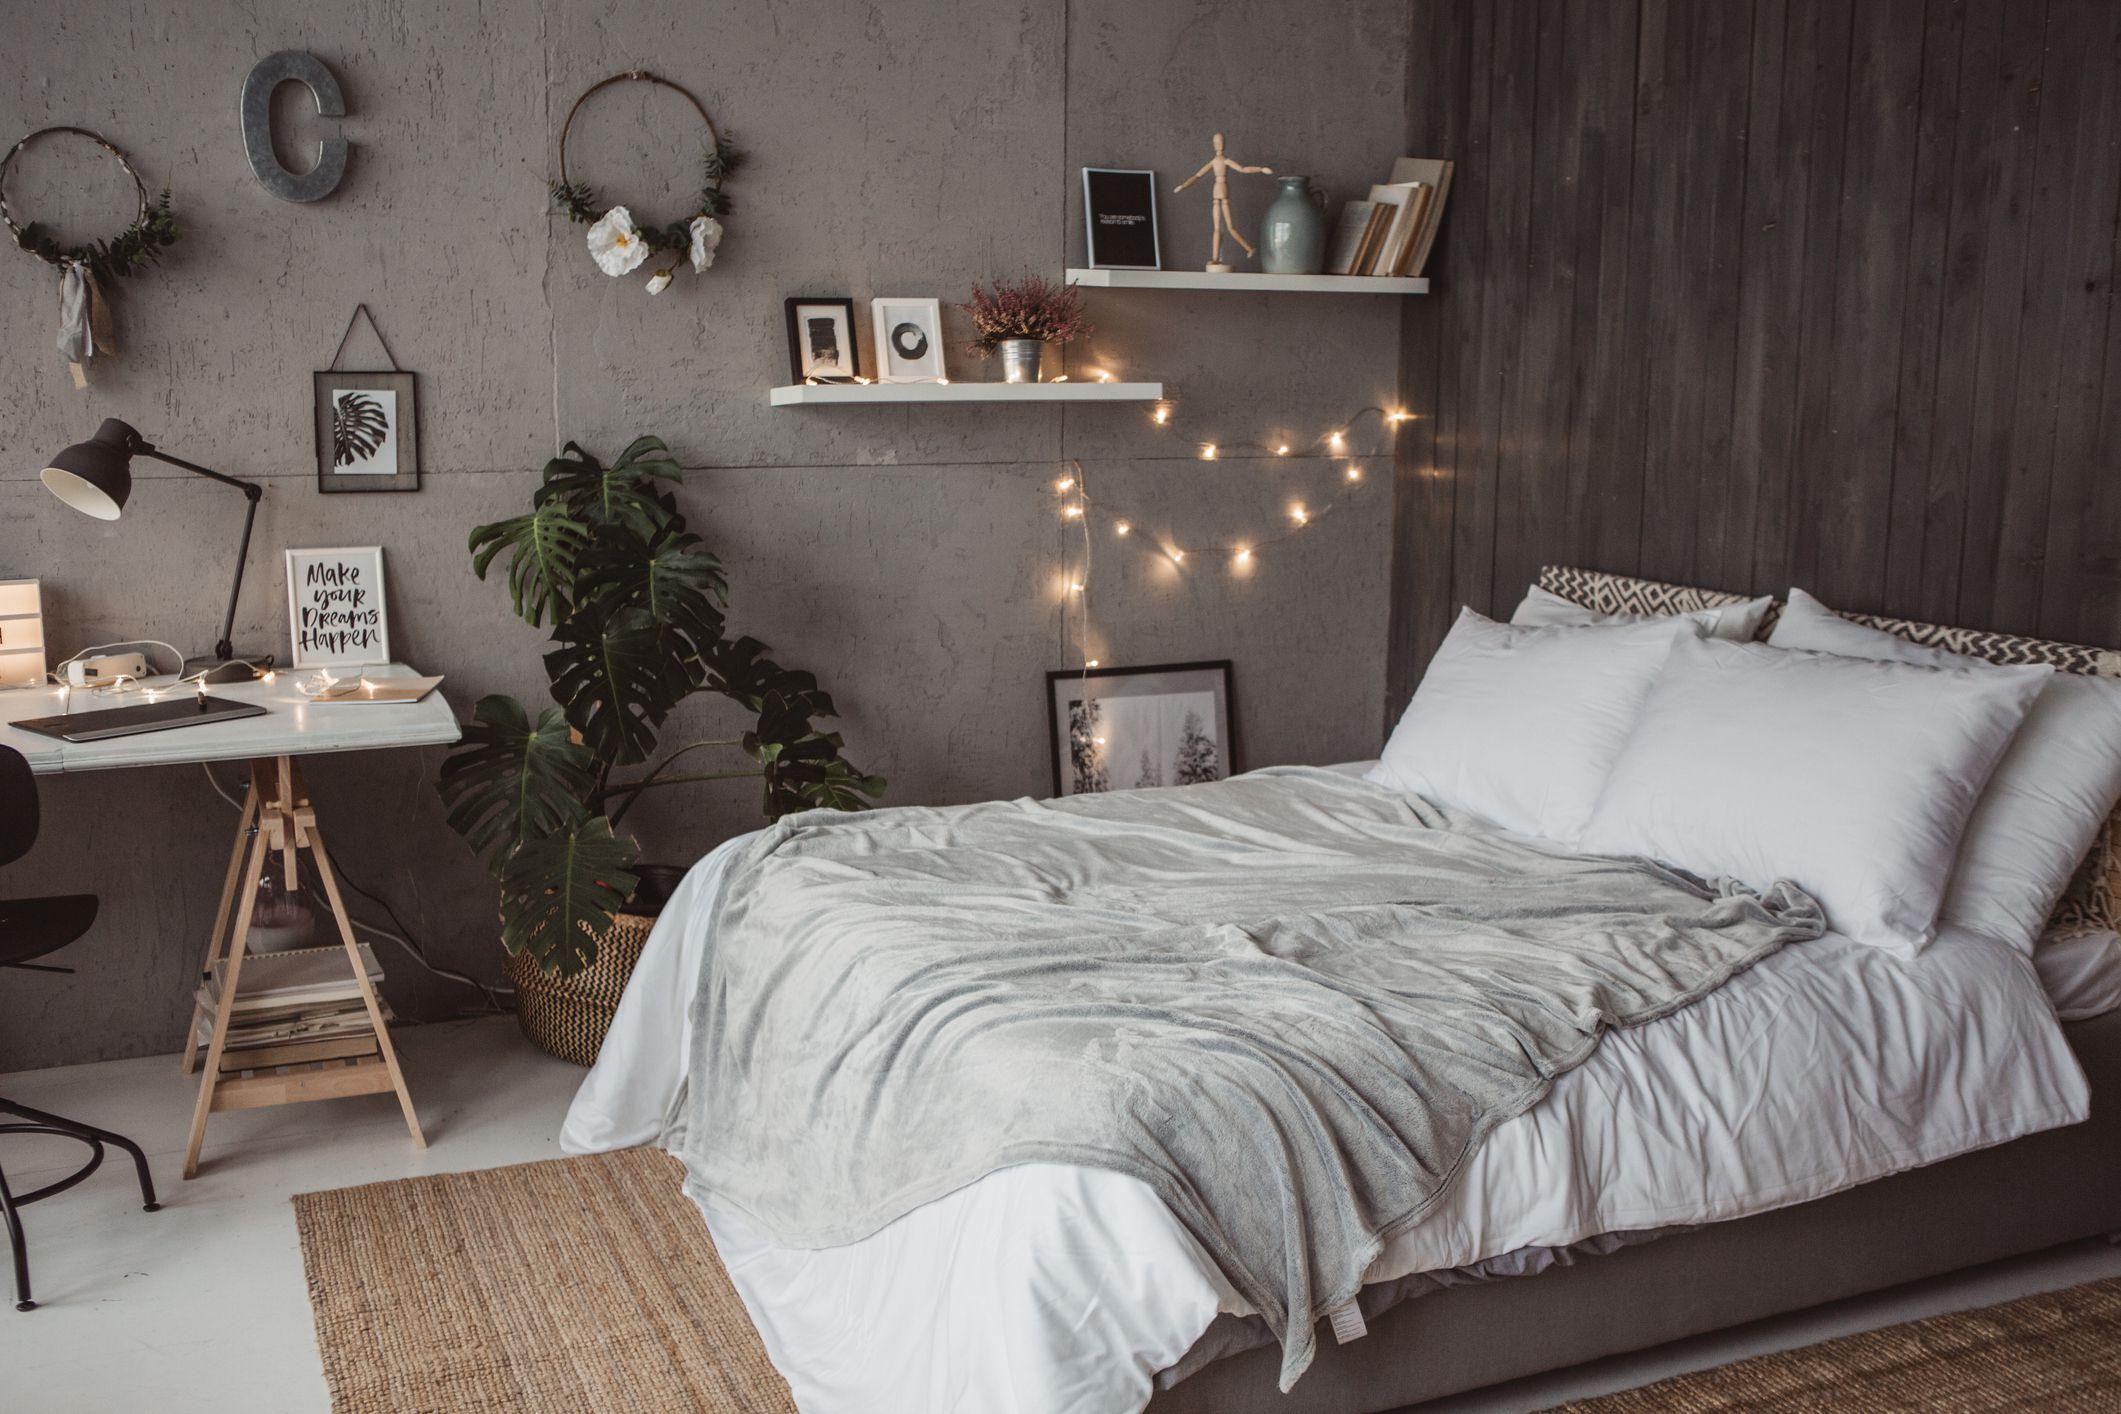 22 Cool Room Ideas for Teens on Teenage Simple Bedroom Ideas For Small Rooms  id=81849